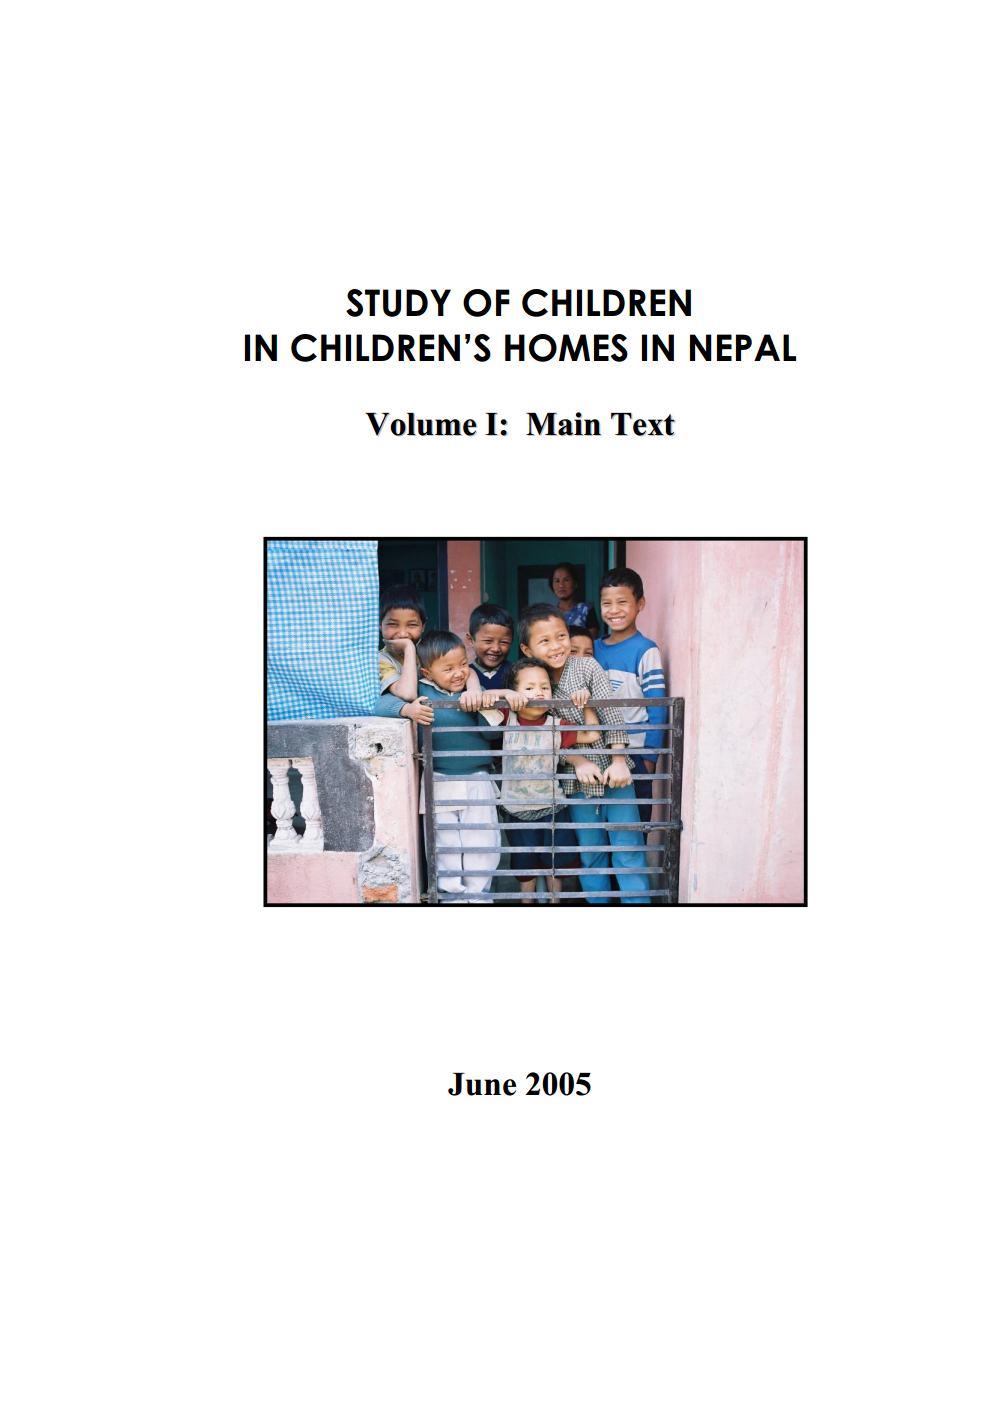 Study of Children in Children's Homes in Nepal